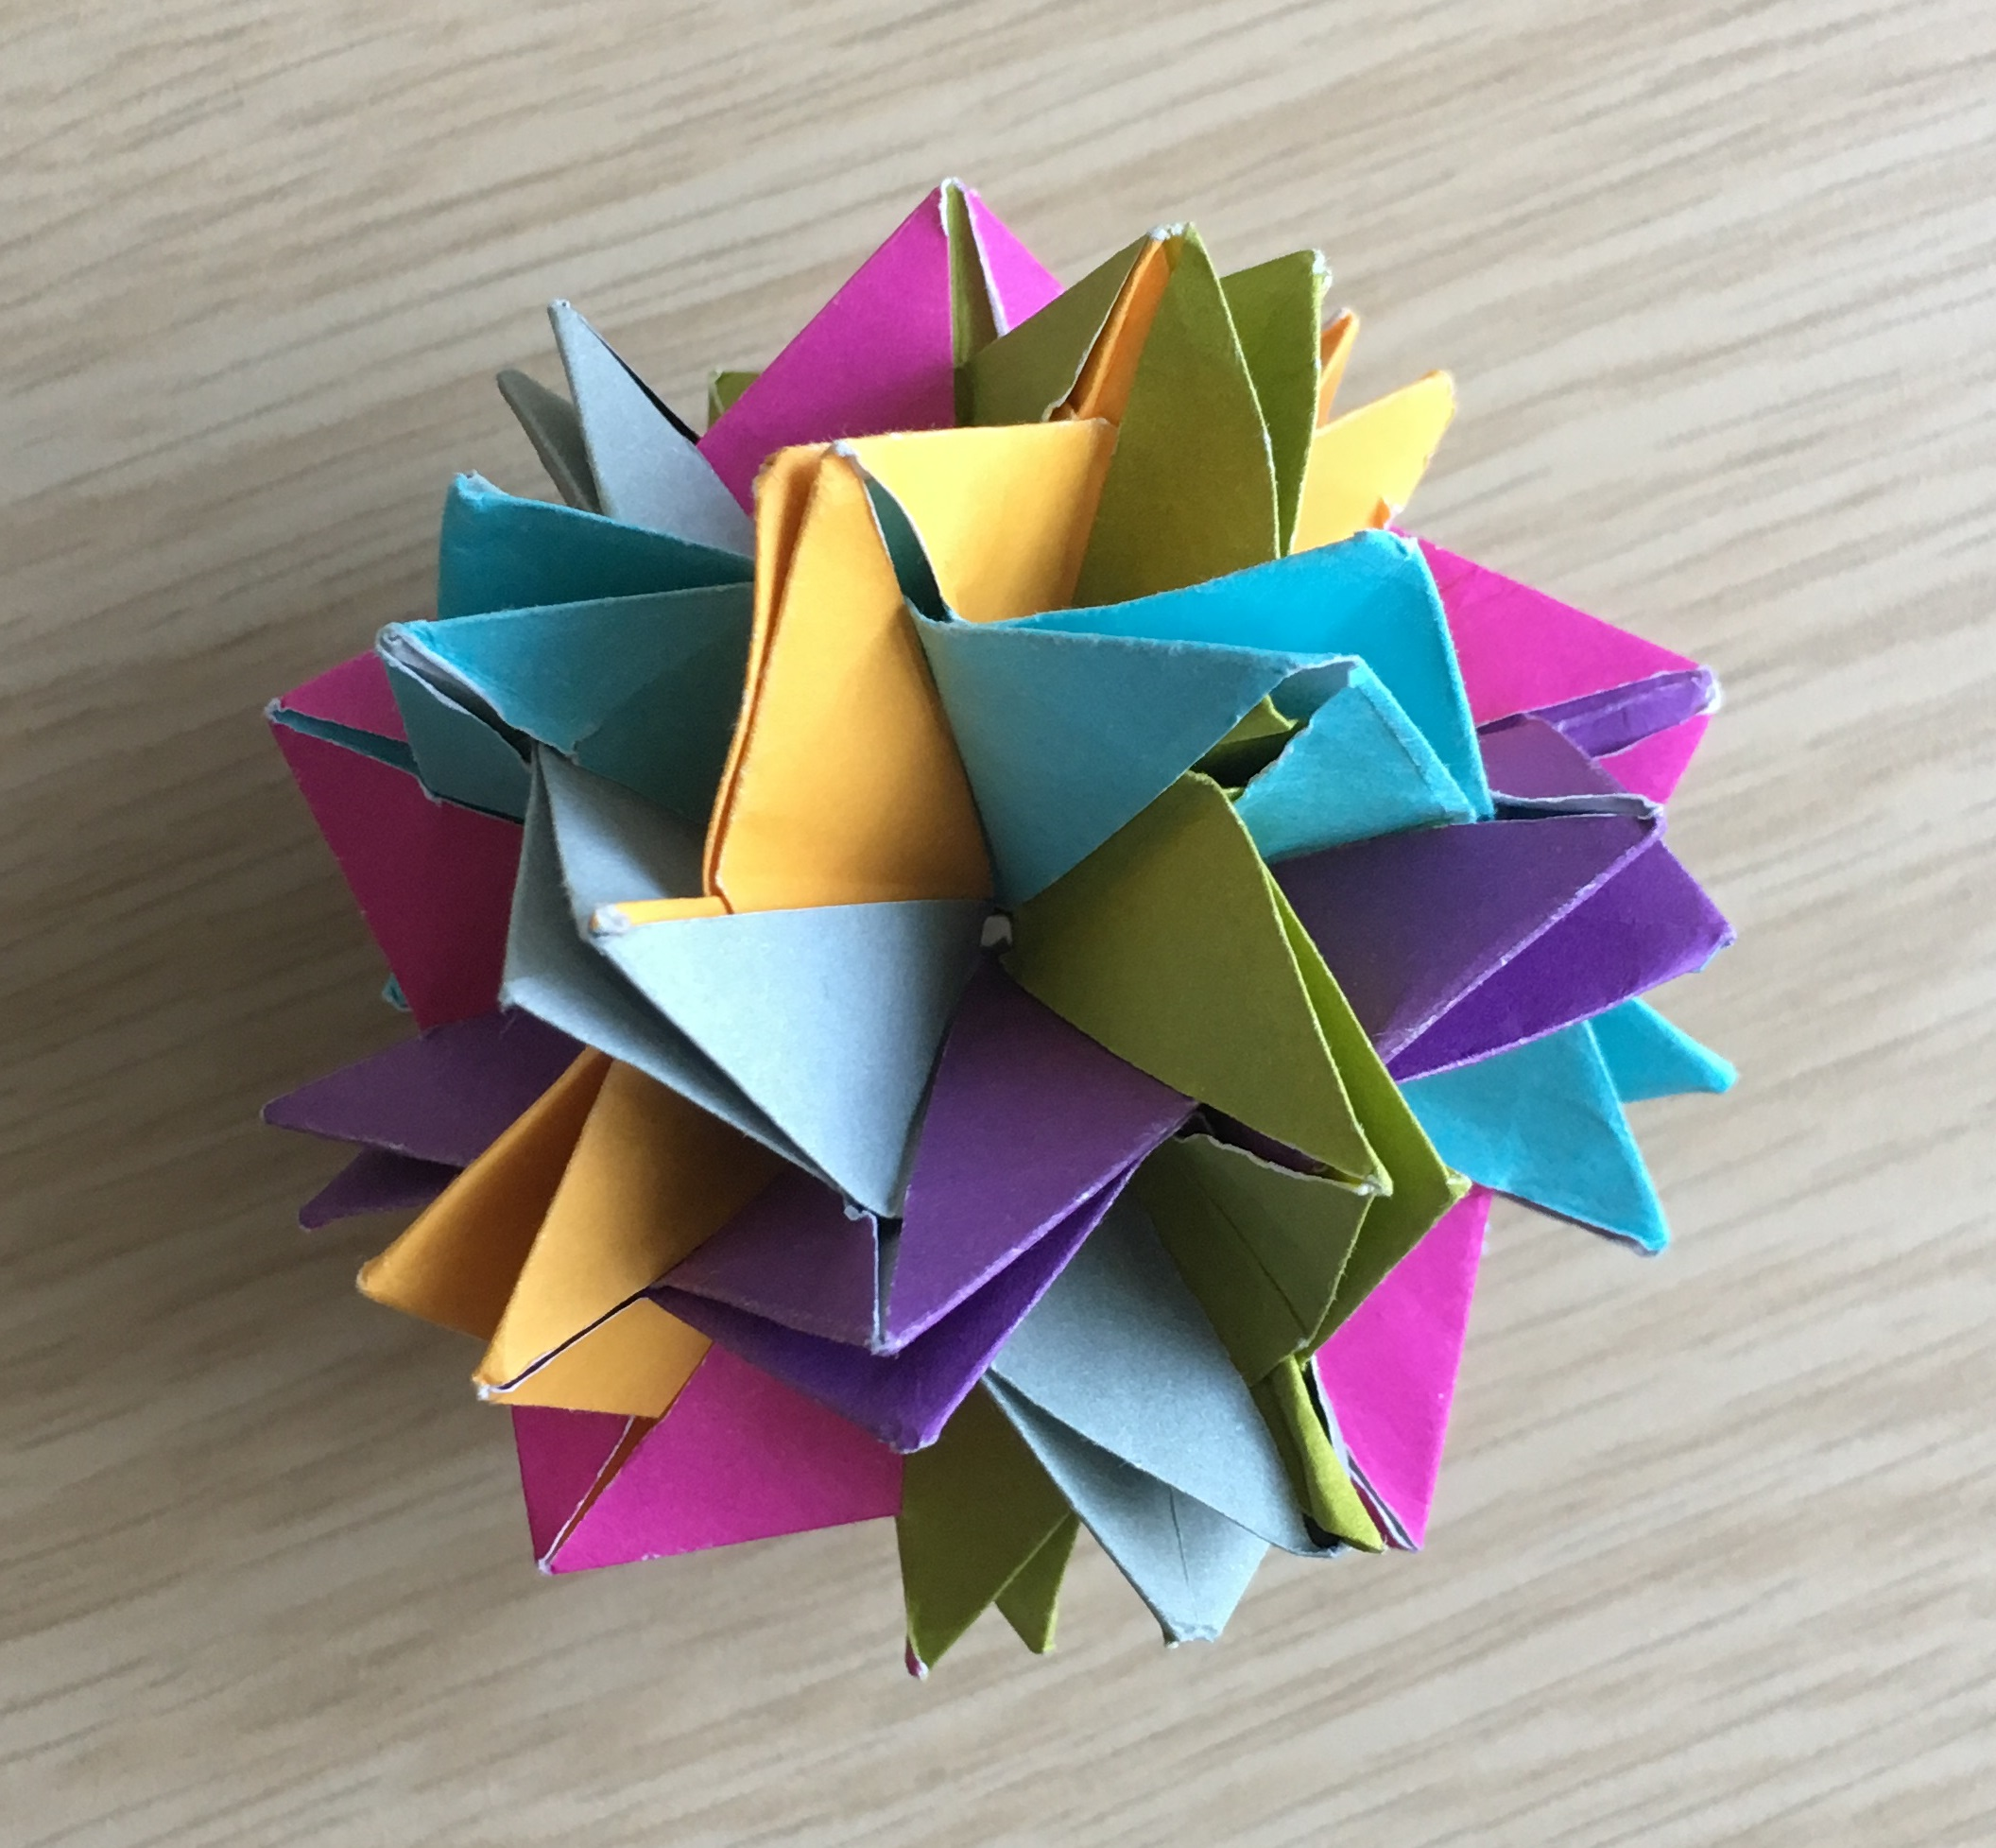 Origami easy Kusudama Dodecahedron - Origami easy tutorial - YouTube | 1955x2112